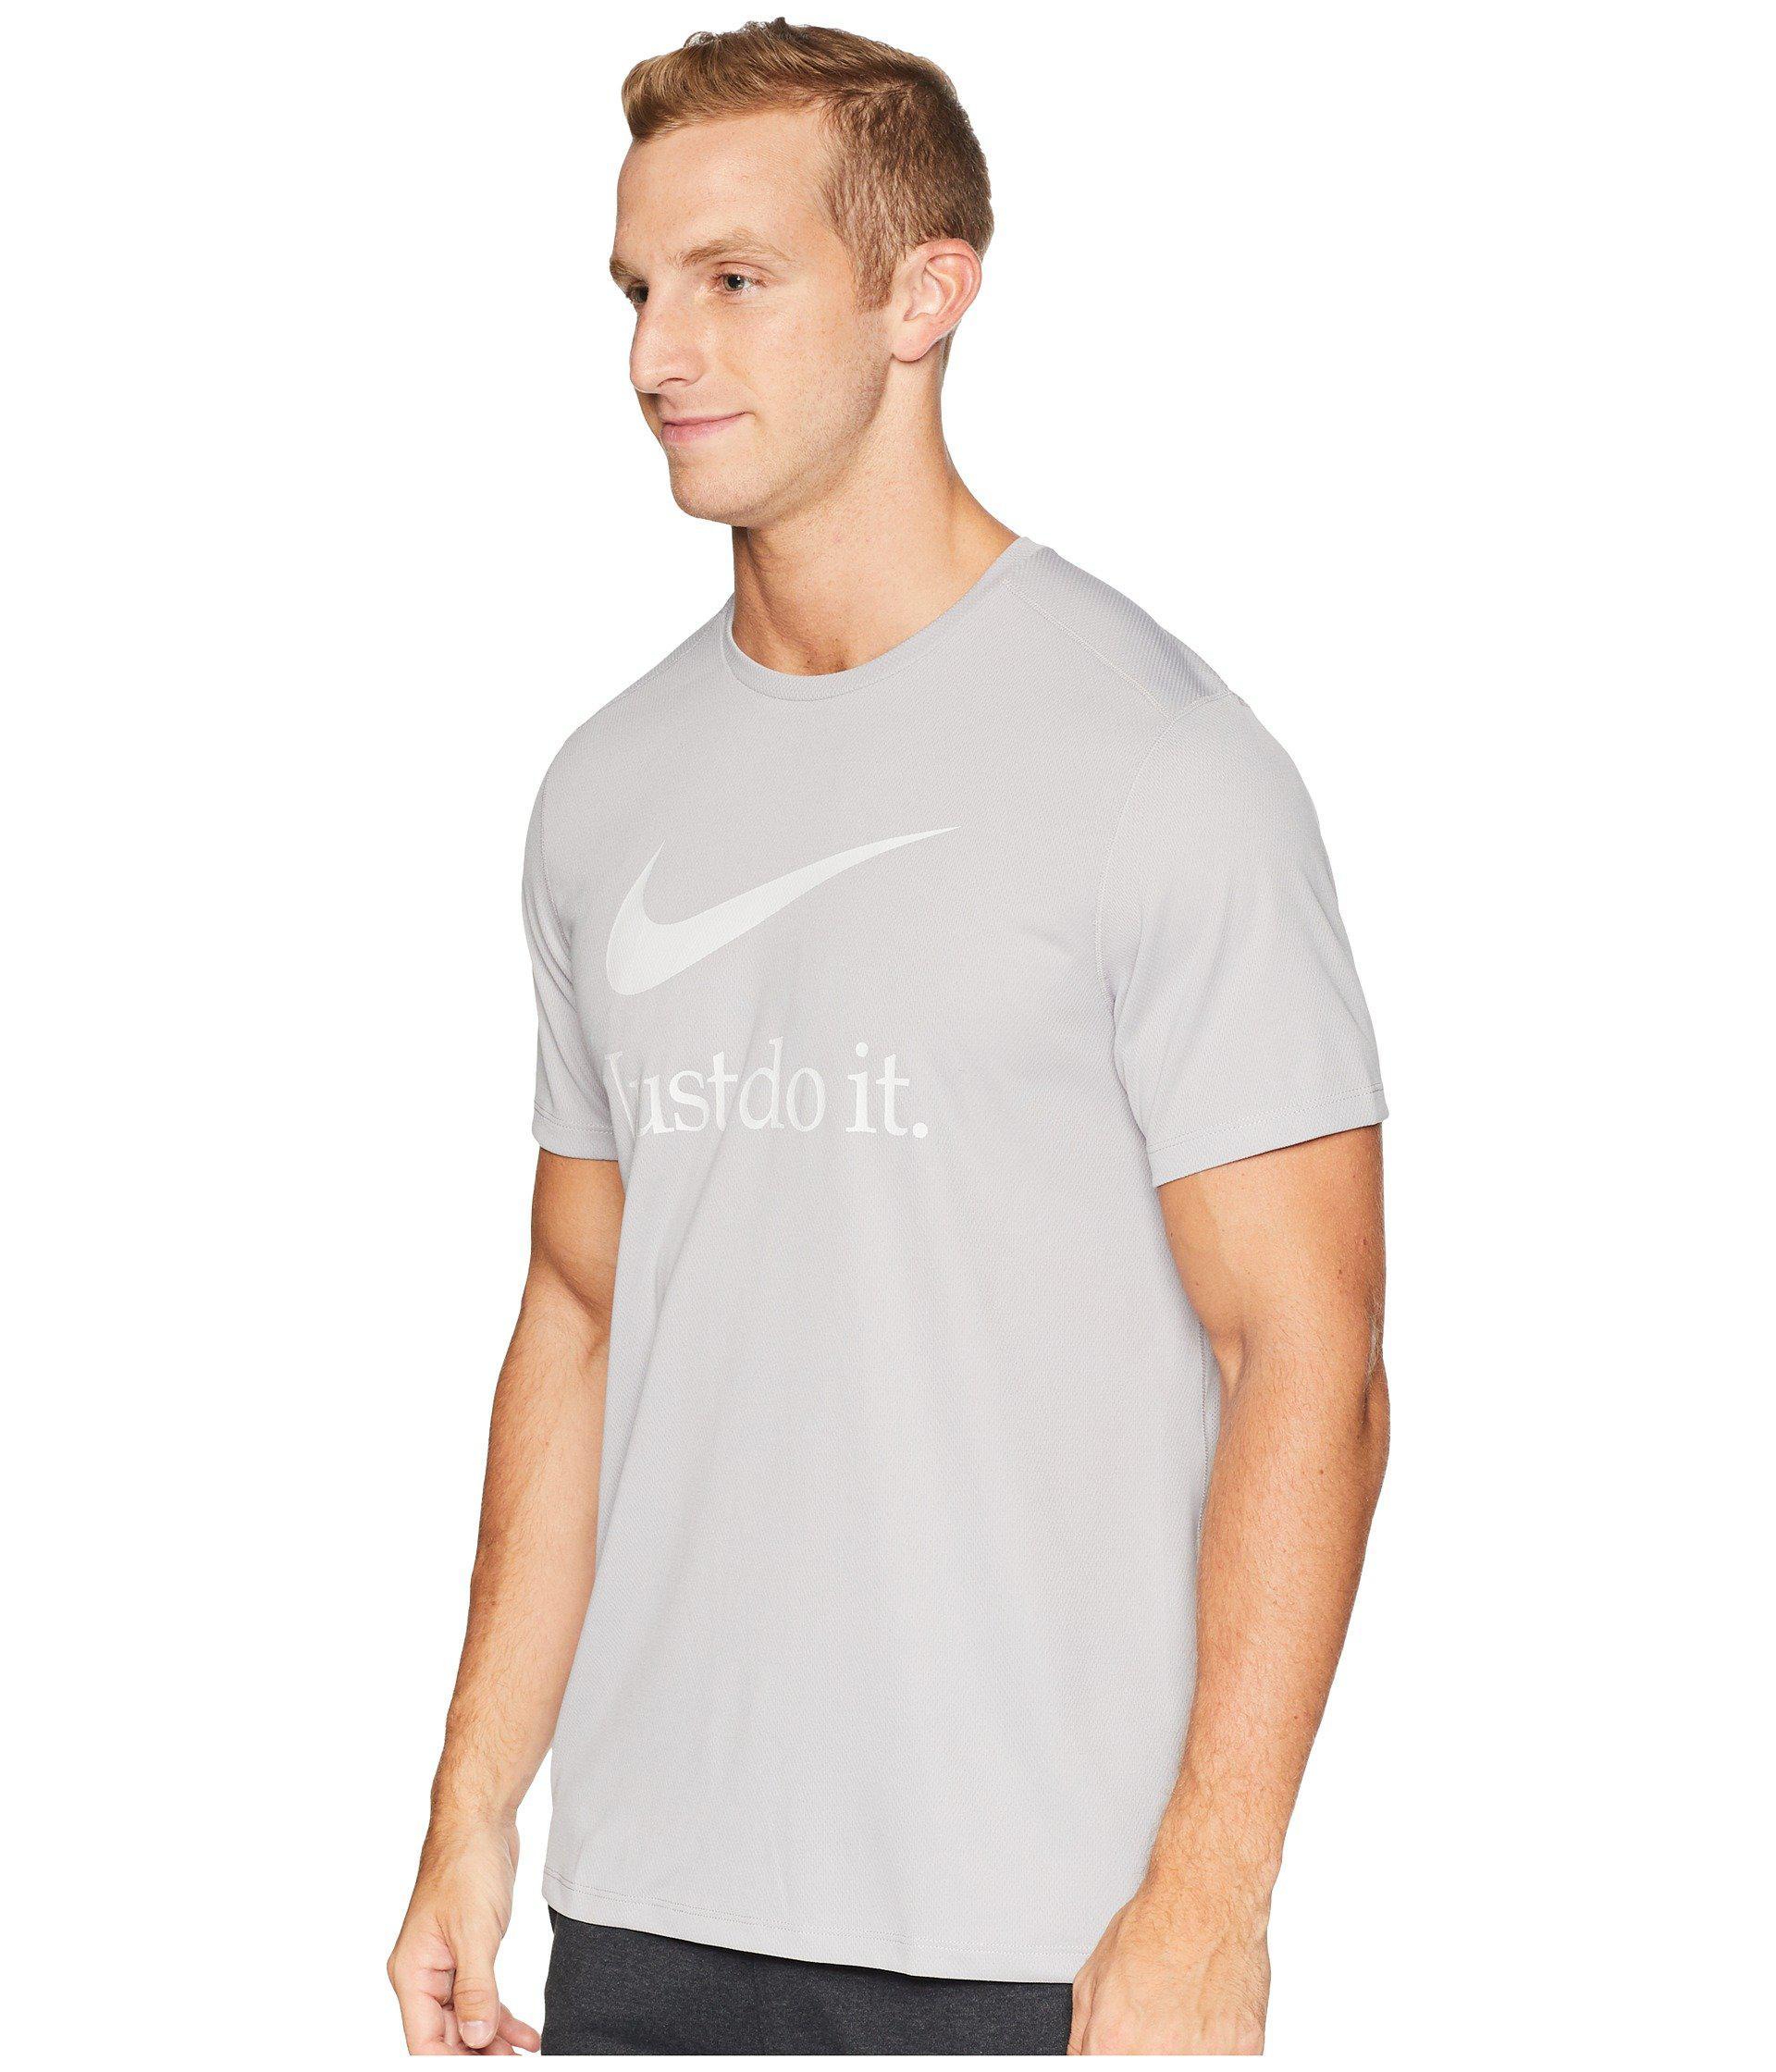 852387bf Lyst - Nike Run Short Sleeve Gx in Gray for Men